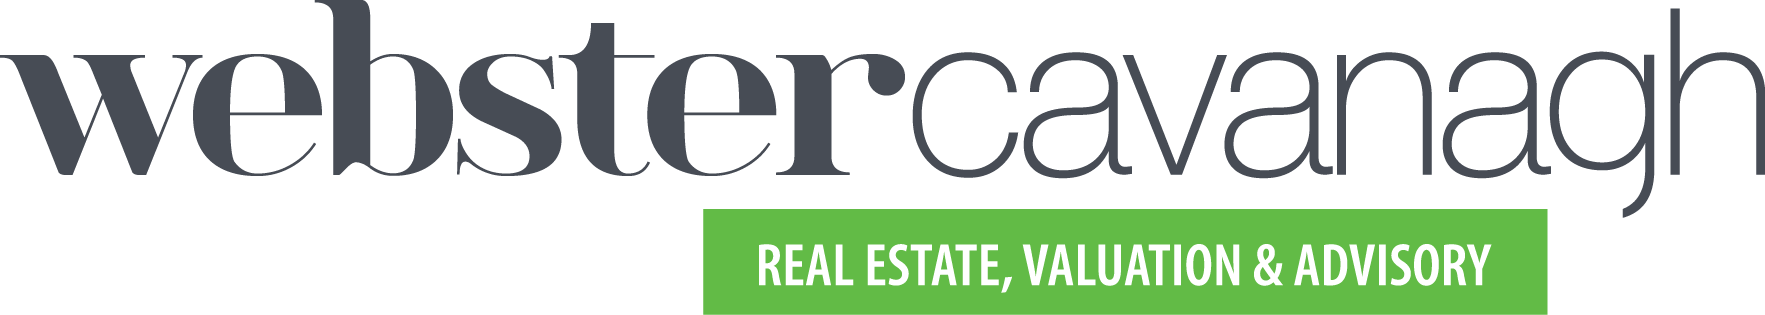 Webster Cavanagh - logo